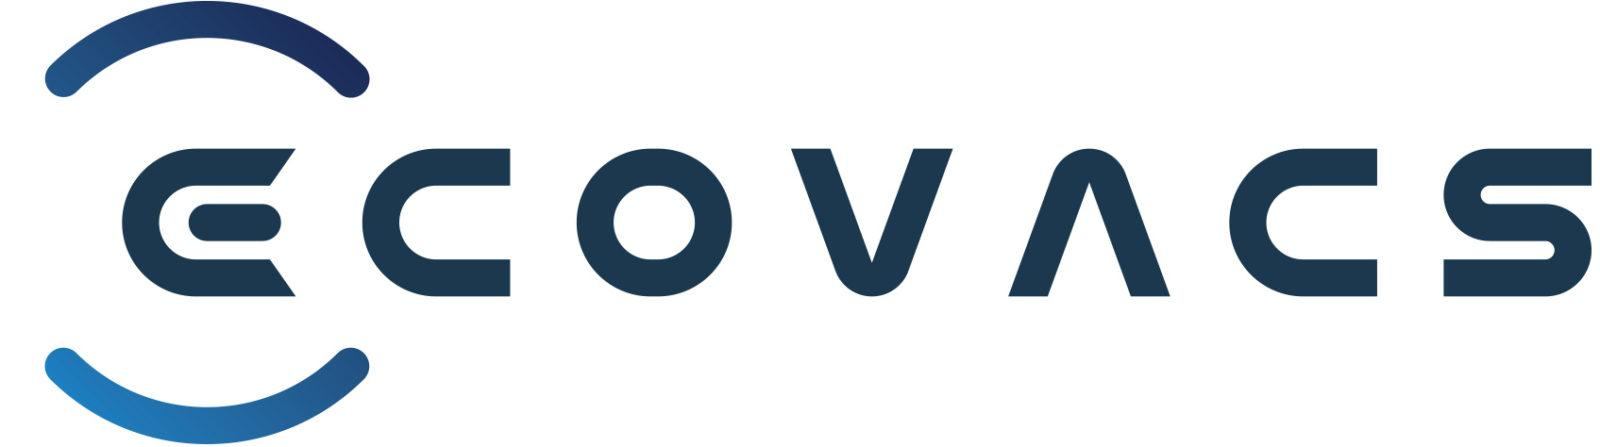 ECOVACS-logo_01